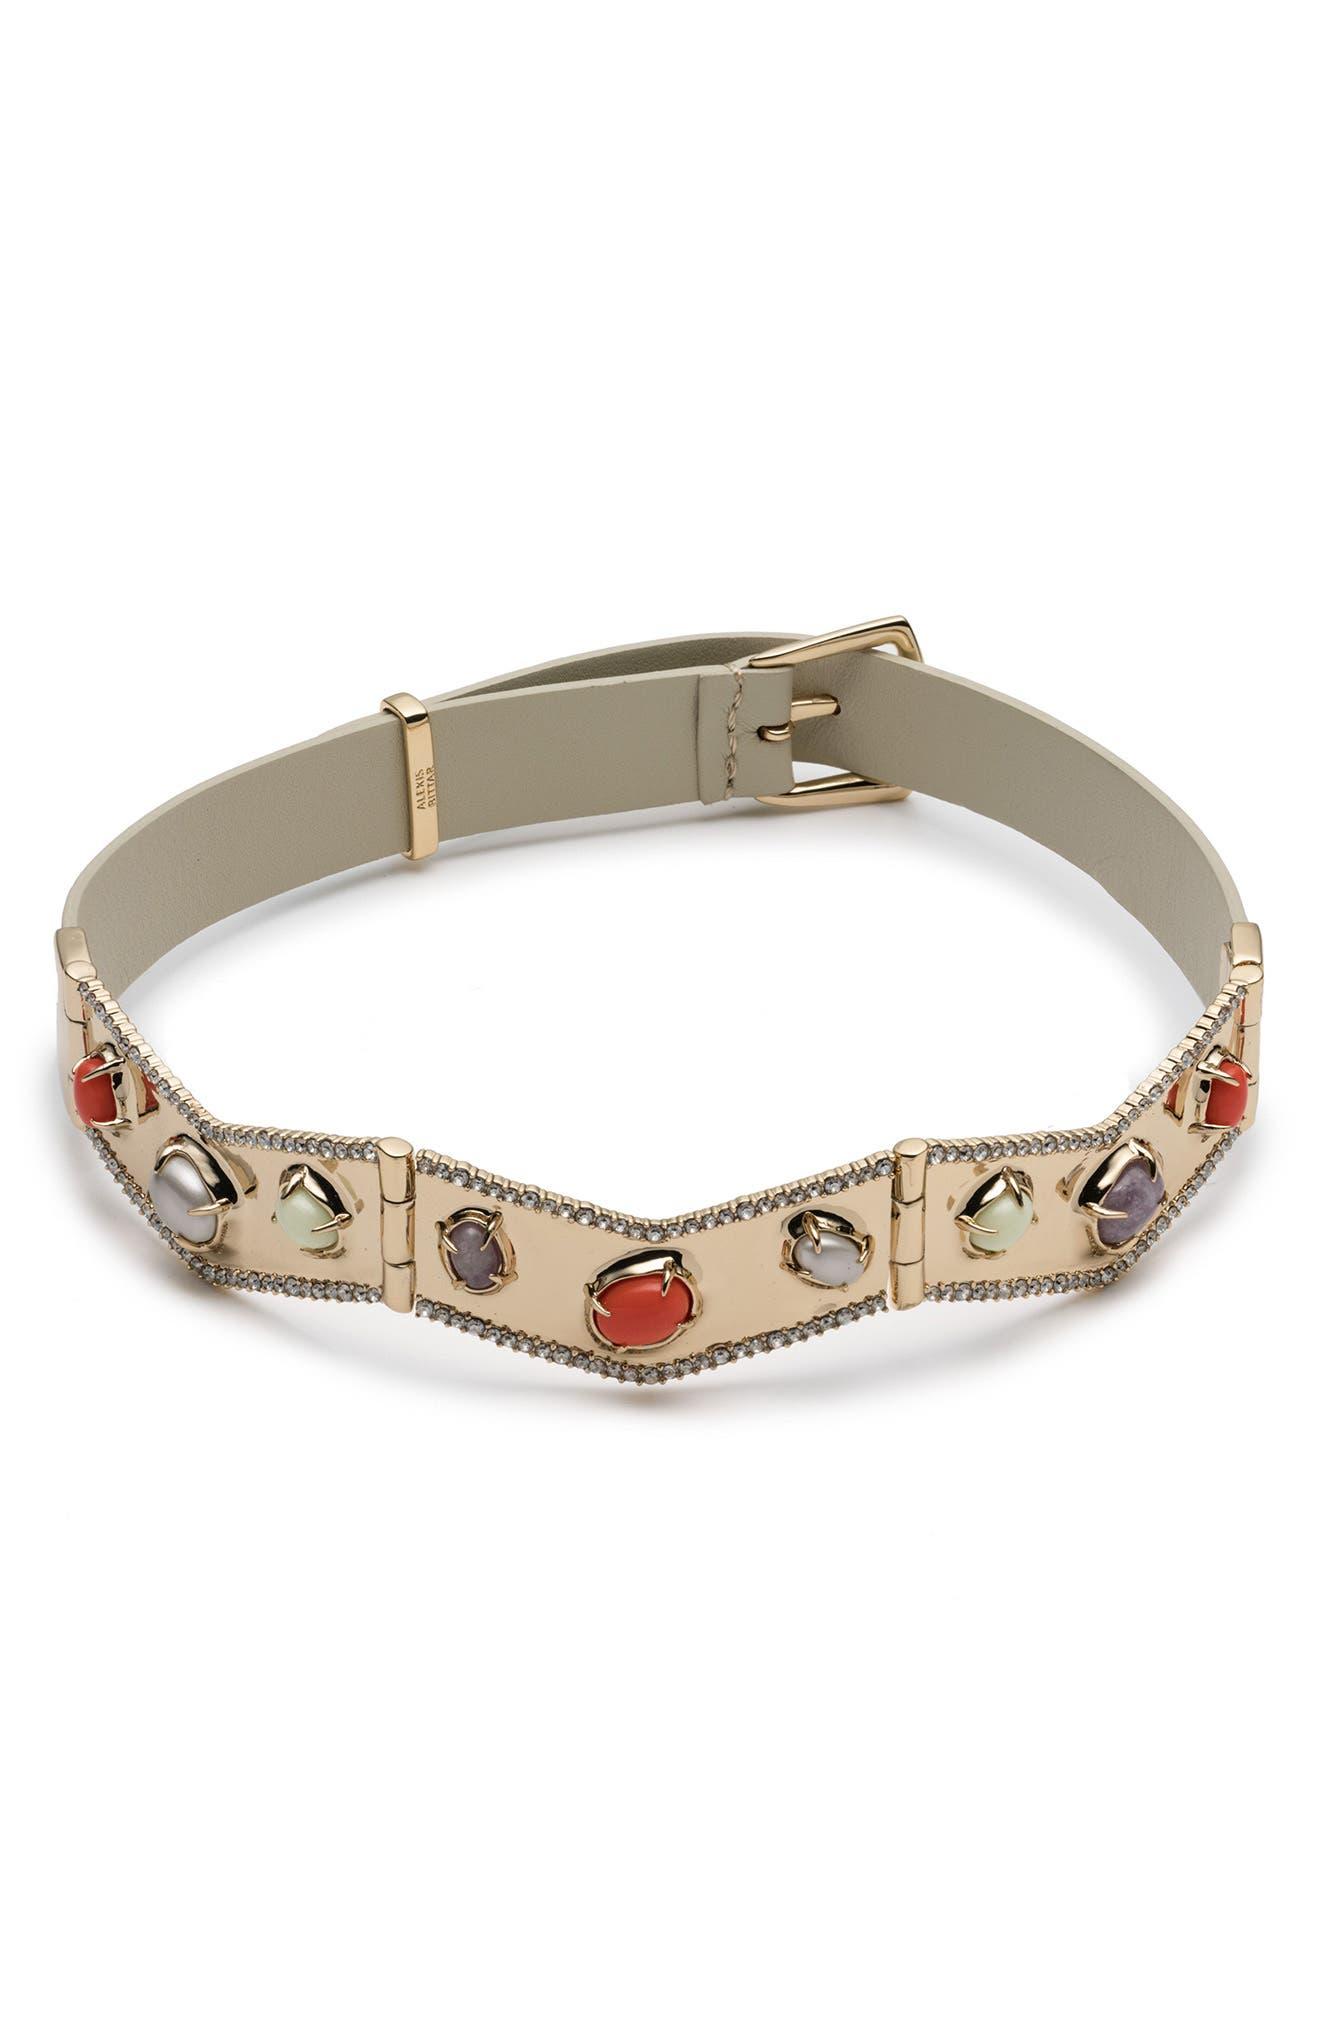 Alexis Bittar Cluster Buckle Leather Bracelet